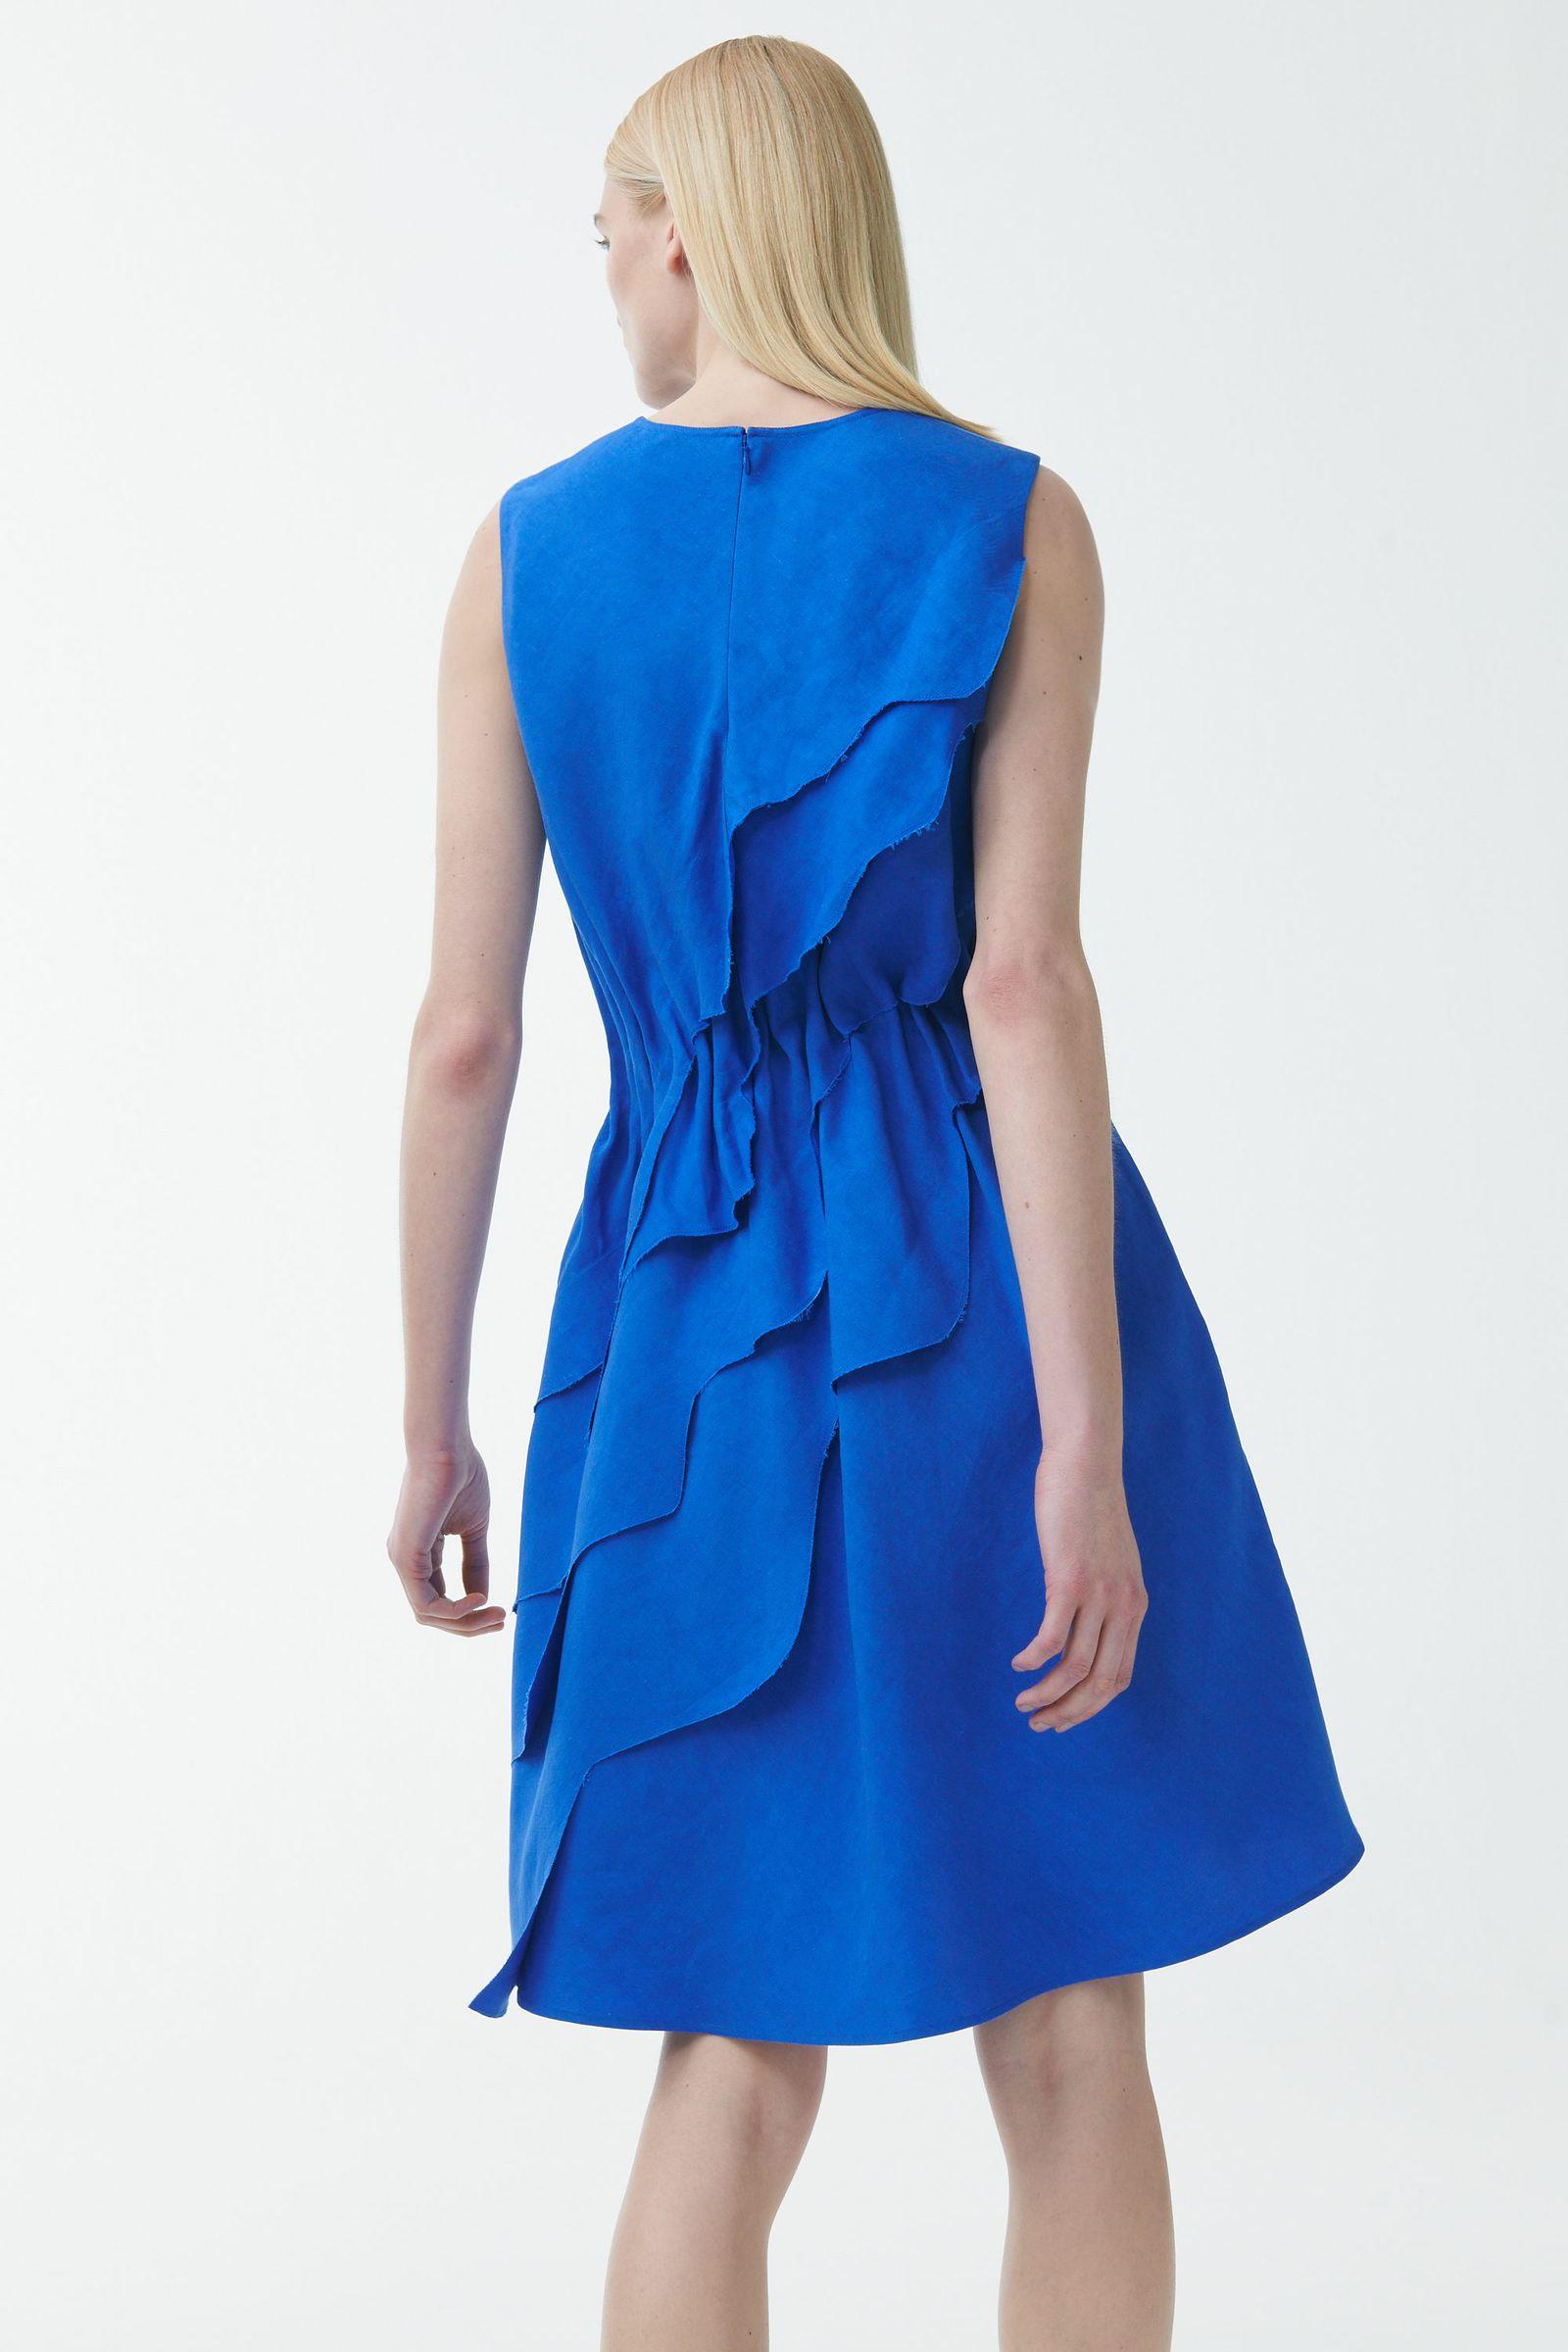 COS 레이어드 리넨 드레스의 블루컬러 ECOMLook입니다.